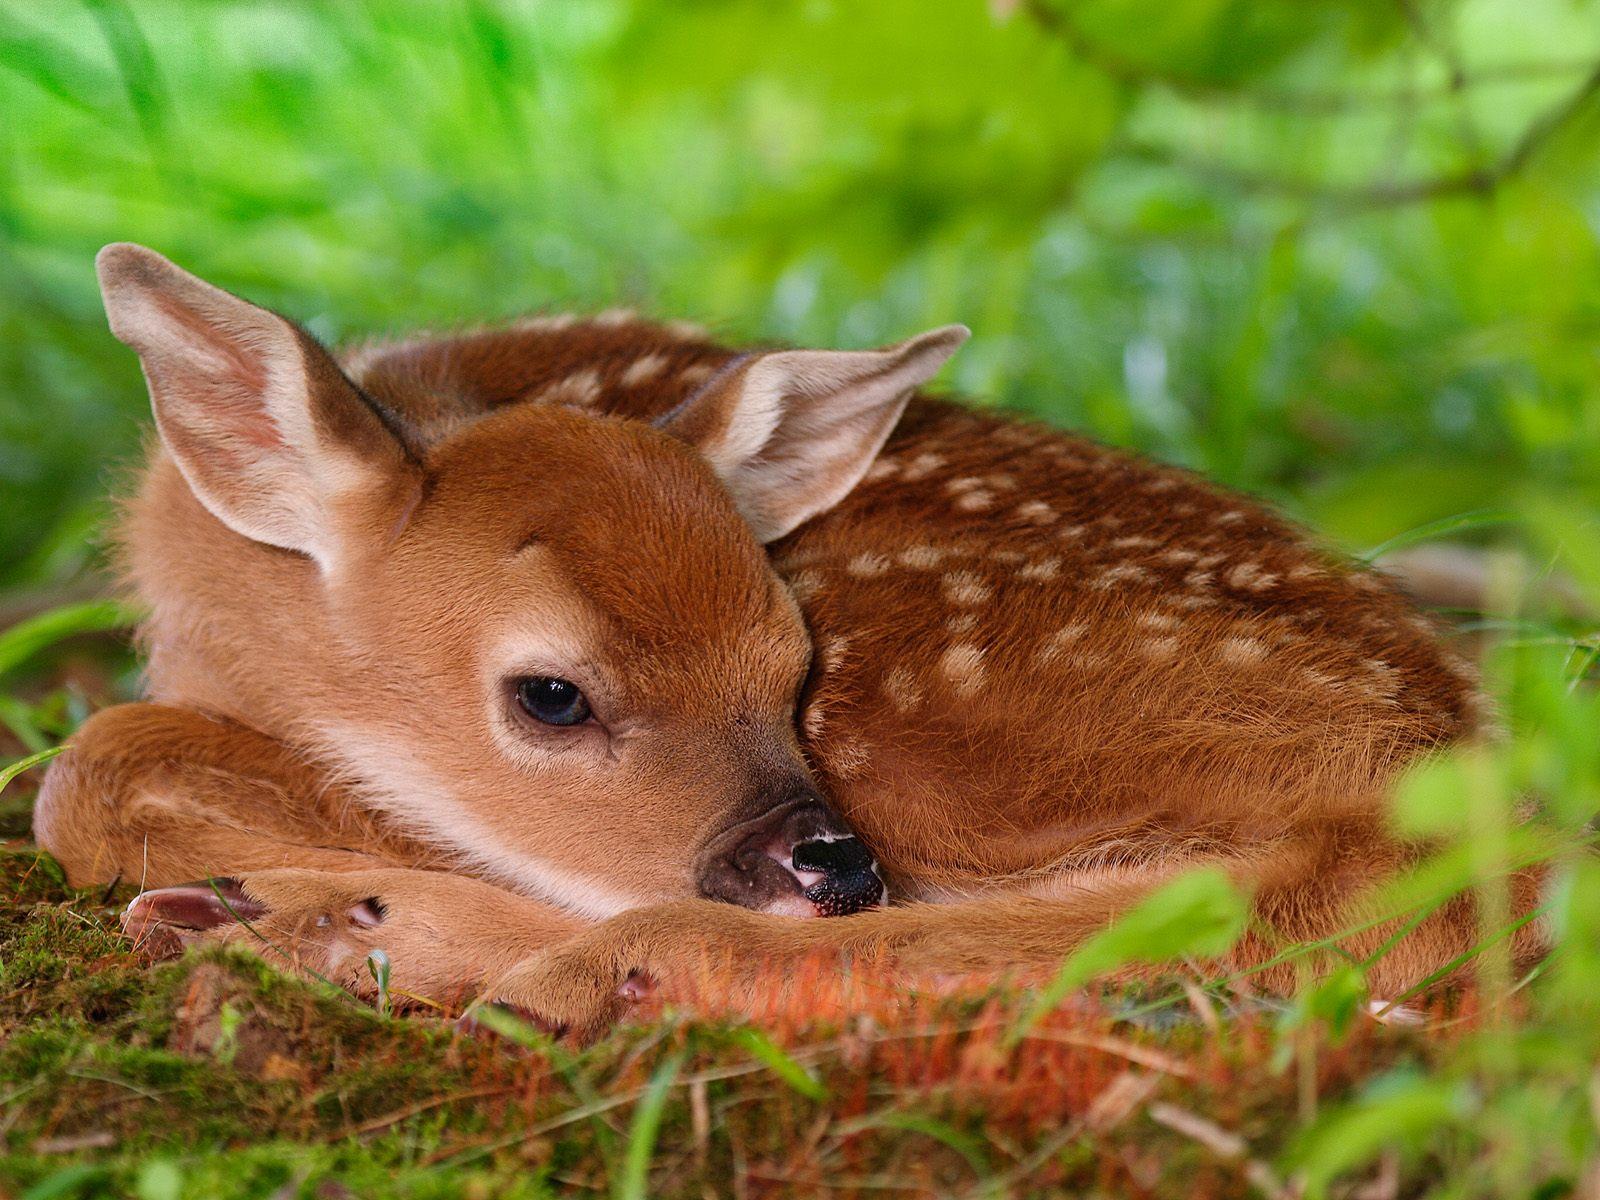 http://4.bp.blogspot.com/_W1VhkUCefIk/S84Dhh4d3II/AAAAAAAAAFU/32AeMBoJLQw/s1600/animal_0004.jpg